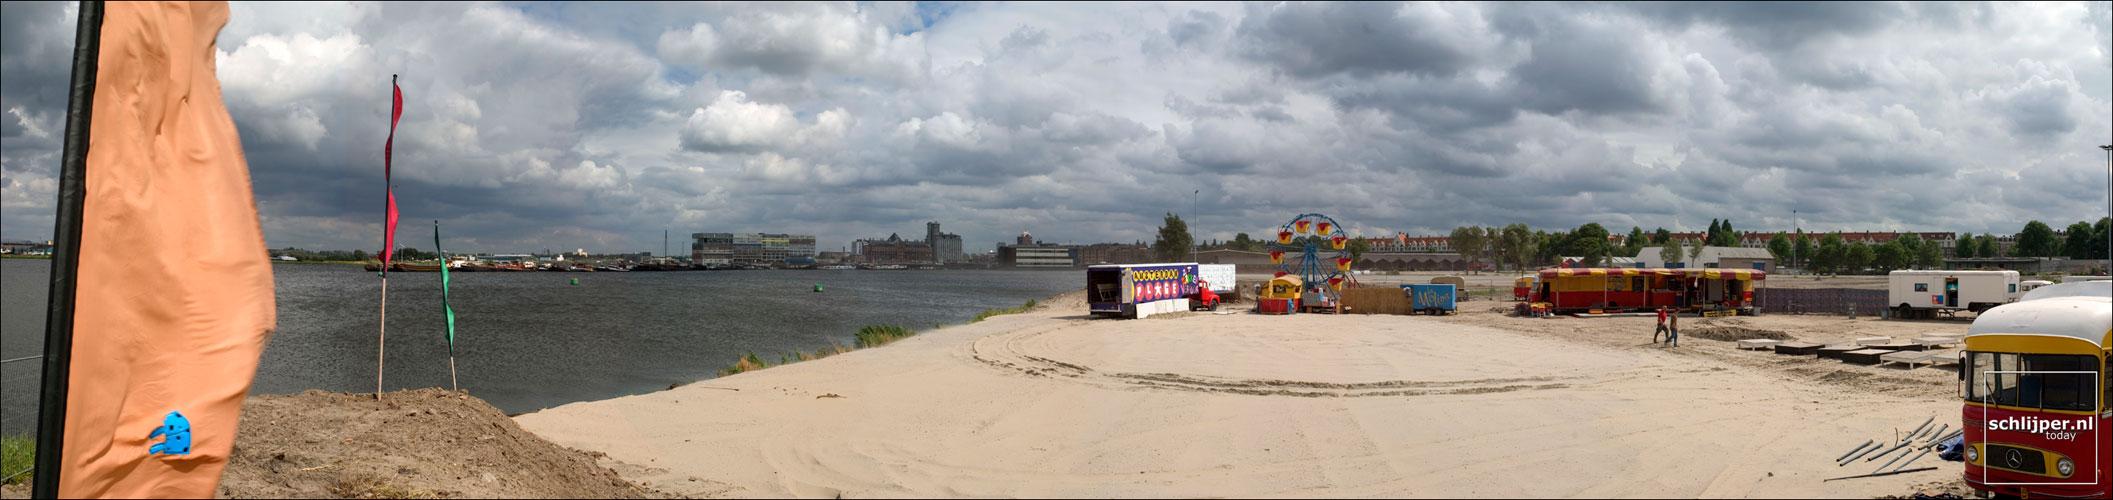 Nederland, Amsterdam, 17 juni 2004